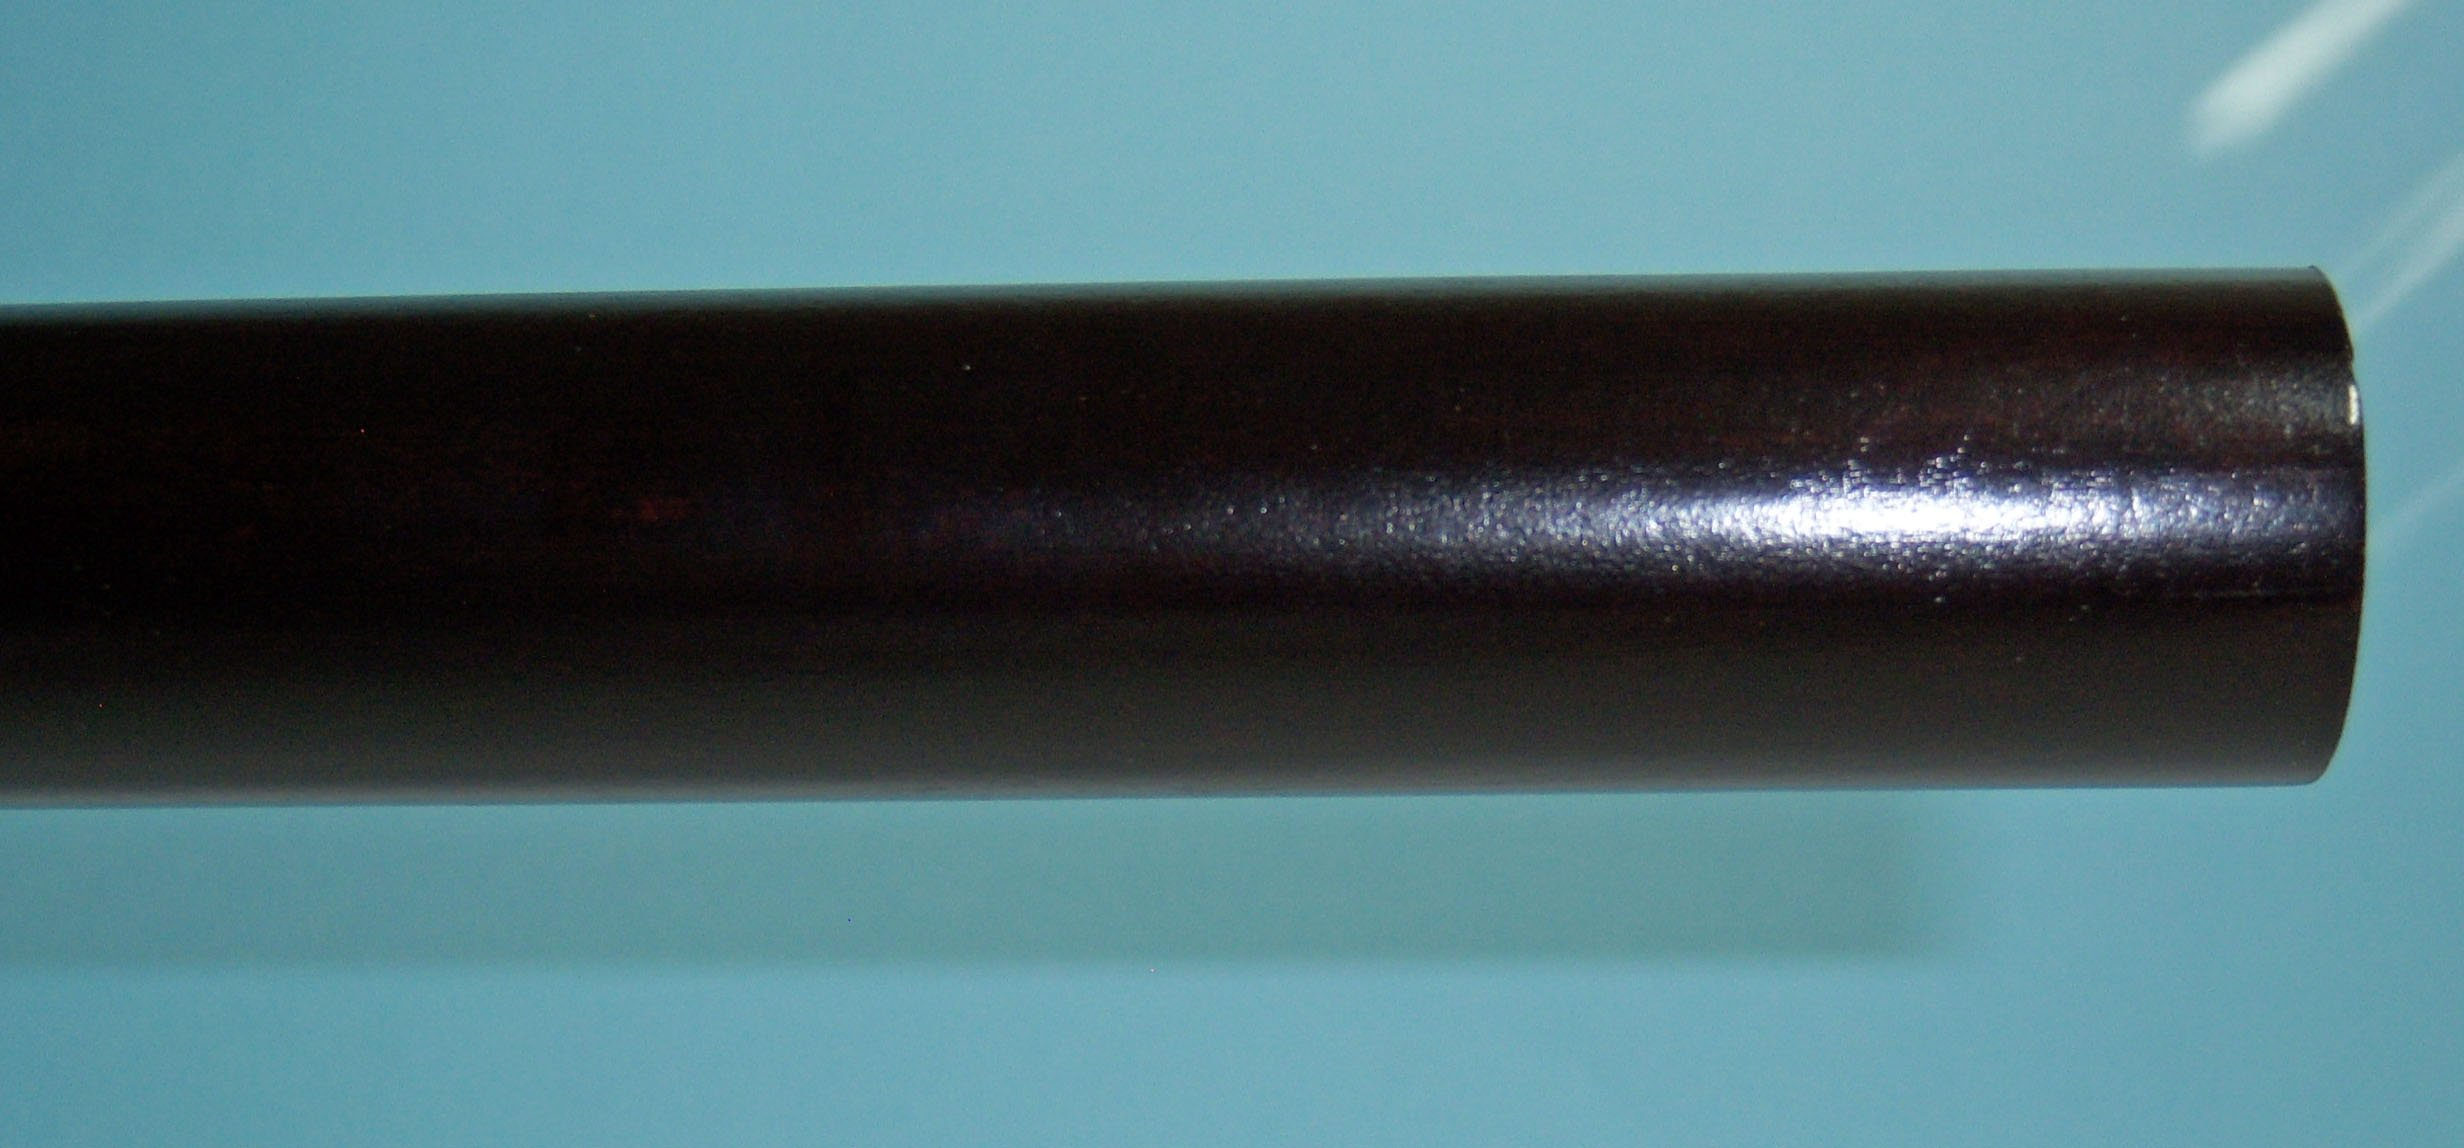 1-3/8 inch Wood Smooth Drapery Rod in Dark Chocolate Finish - 8' long